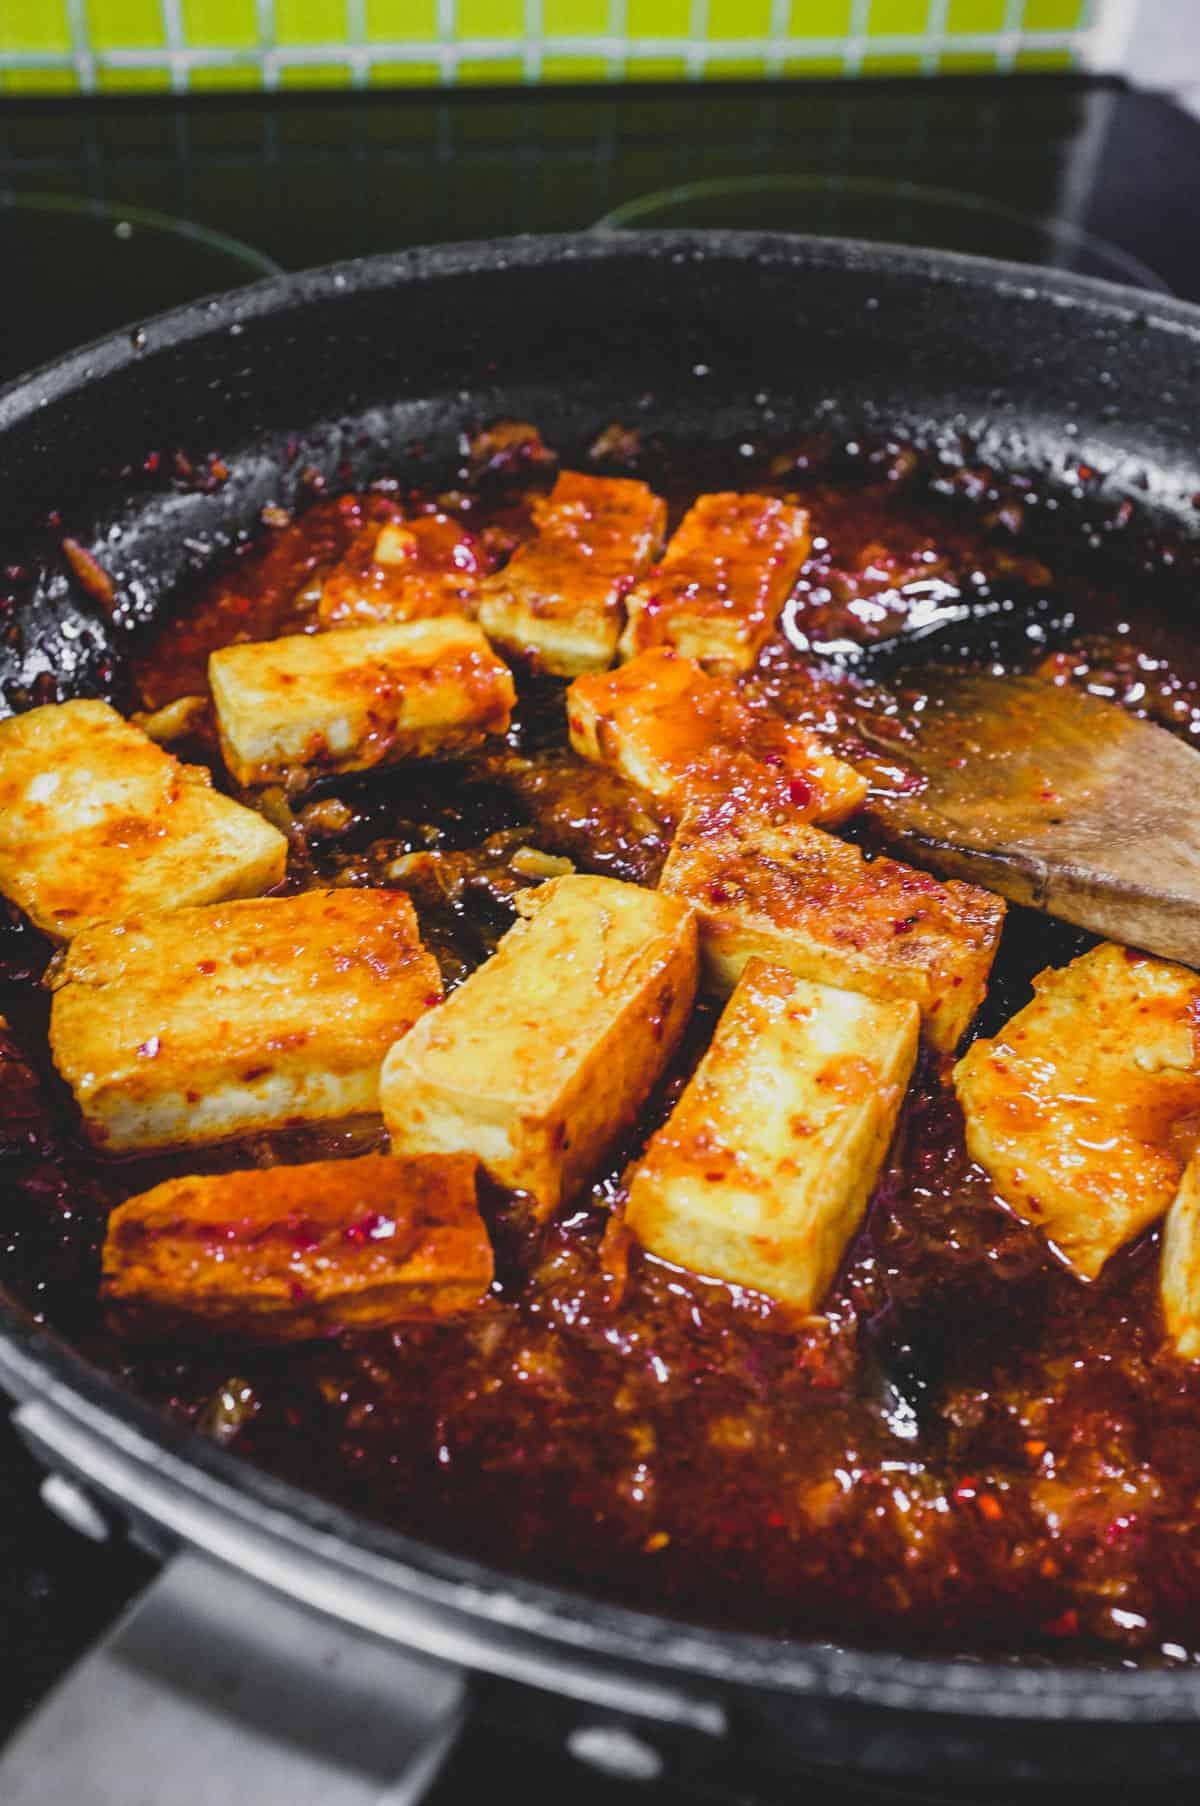 Fried tofu is lightly braised in Korean chilli (gochugaru)